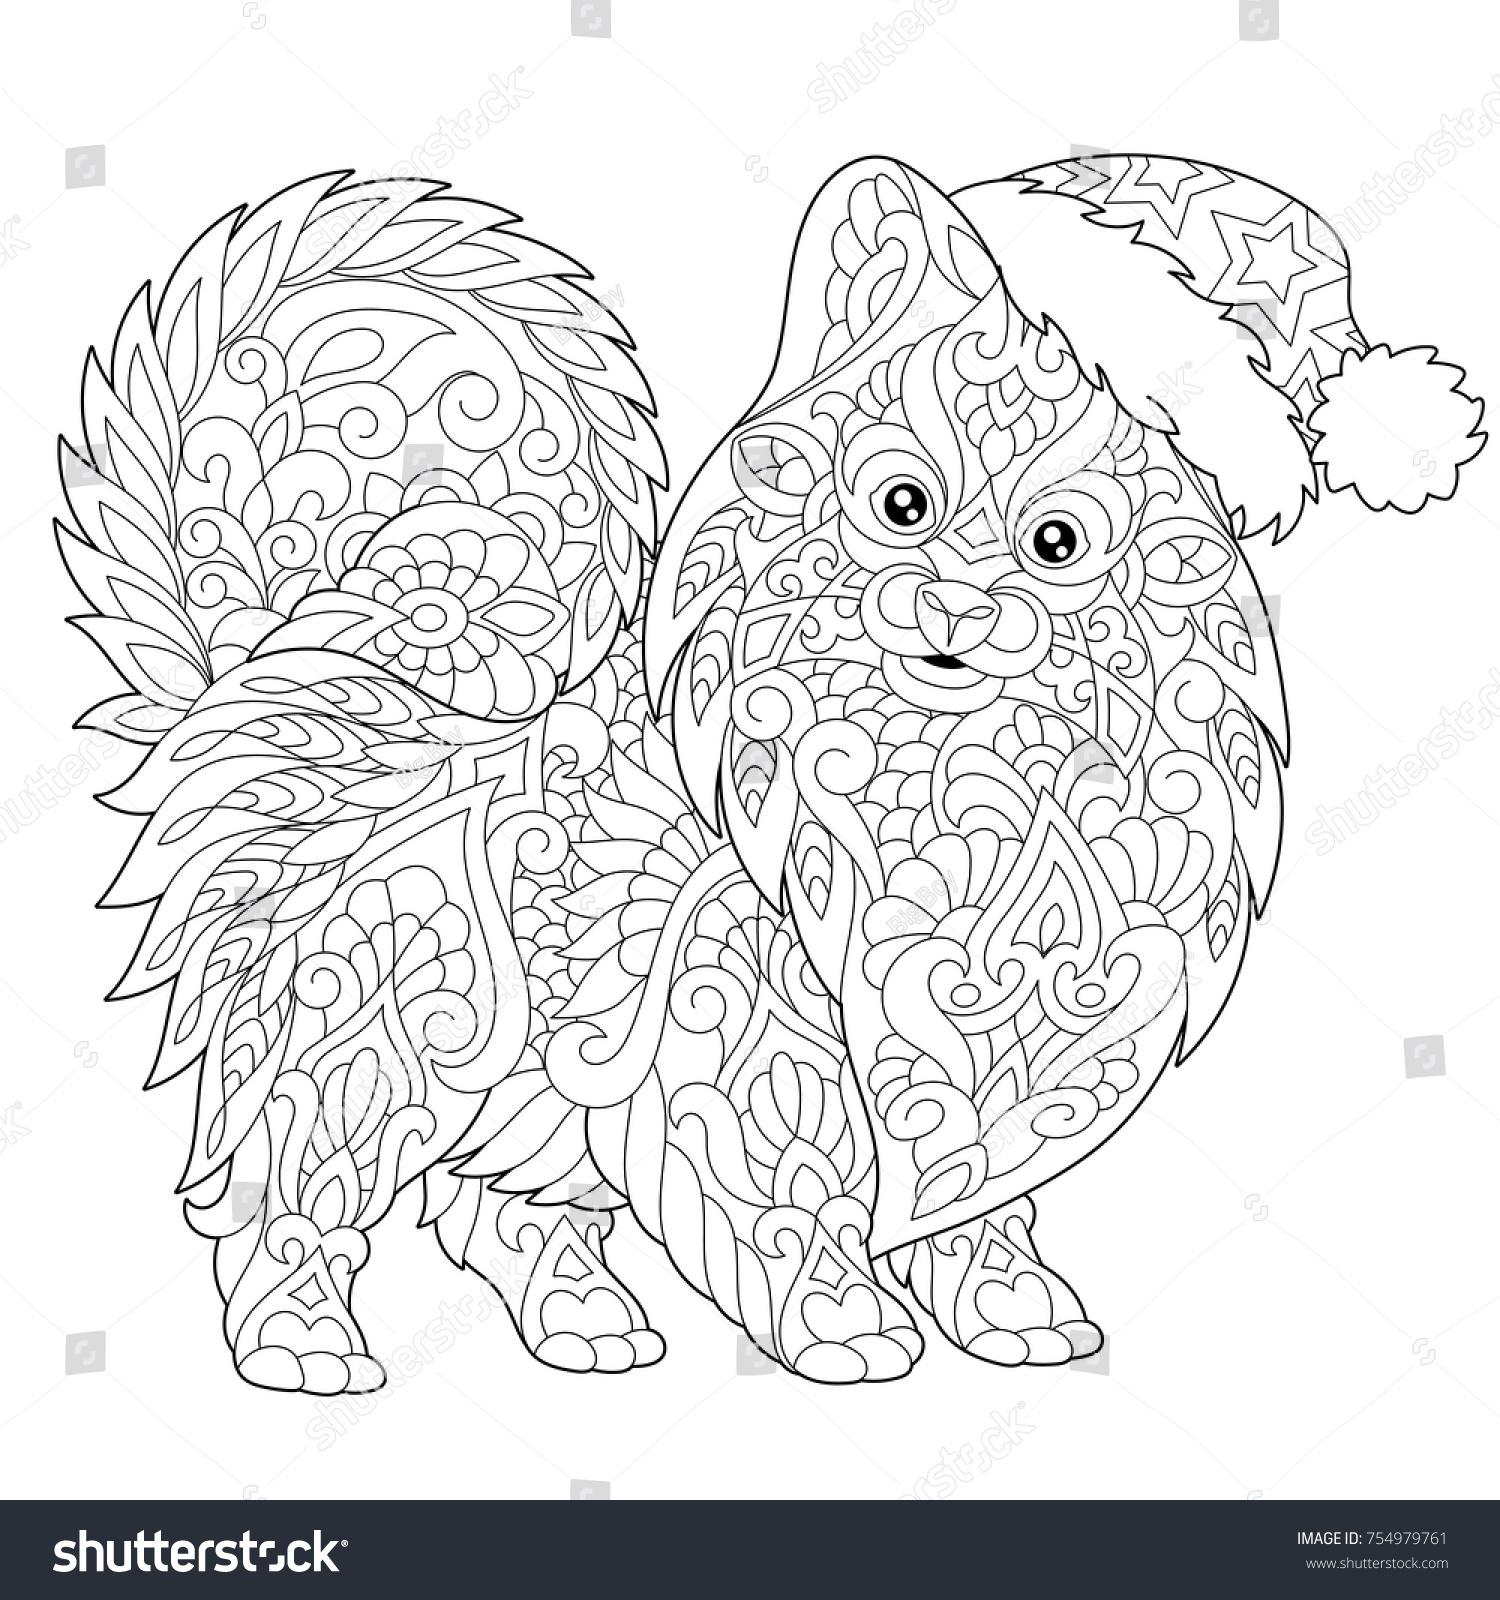 Coloring Page Pomeranian Dog Symbol 2018 Stock Vector 754979761 ...